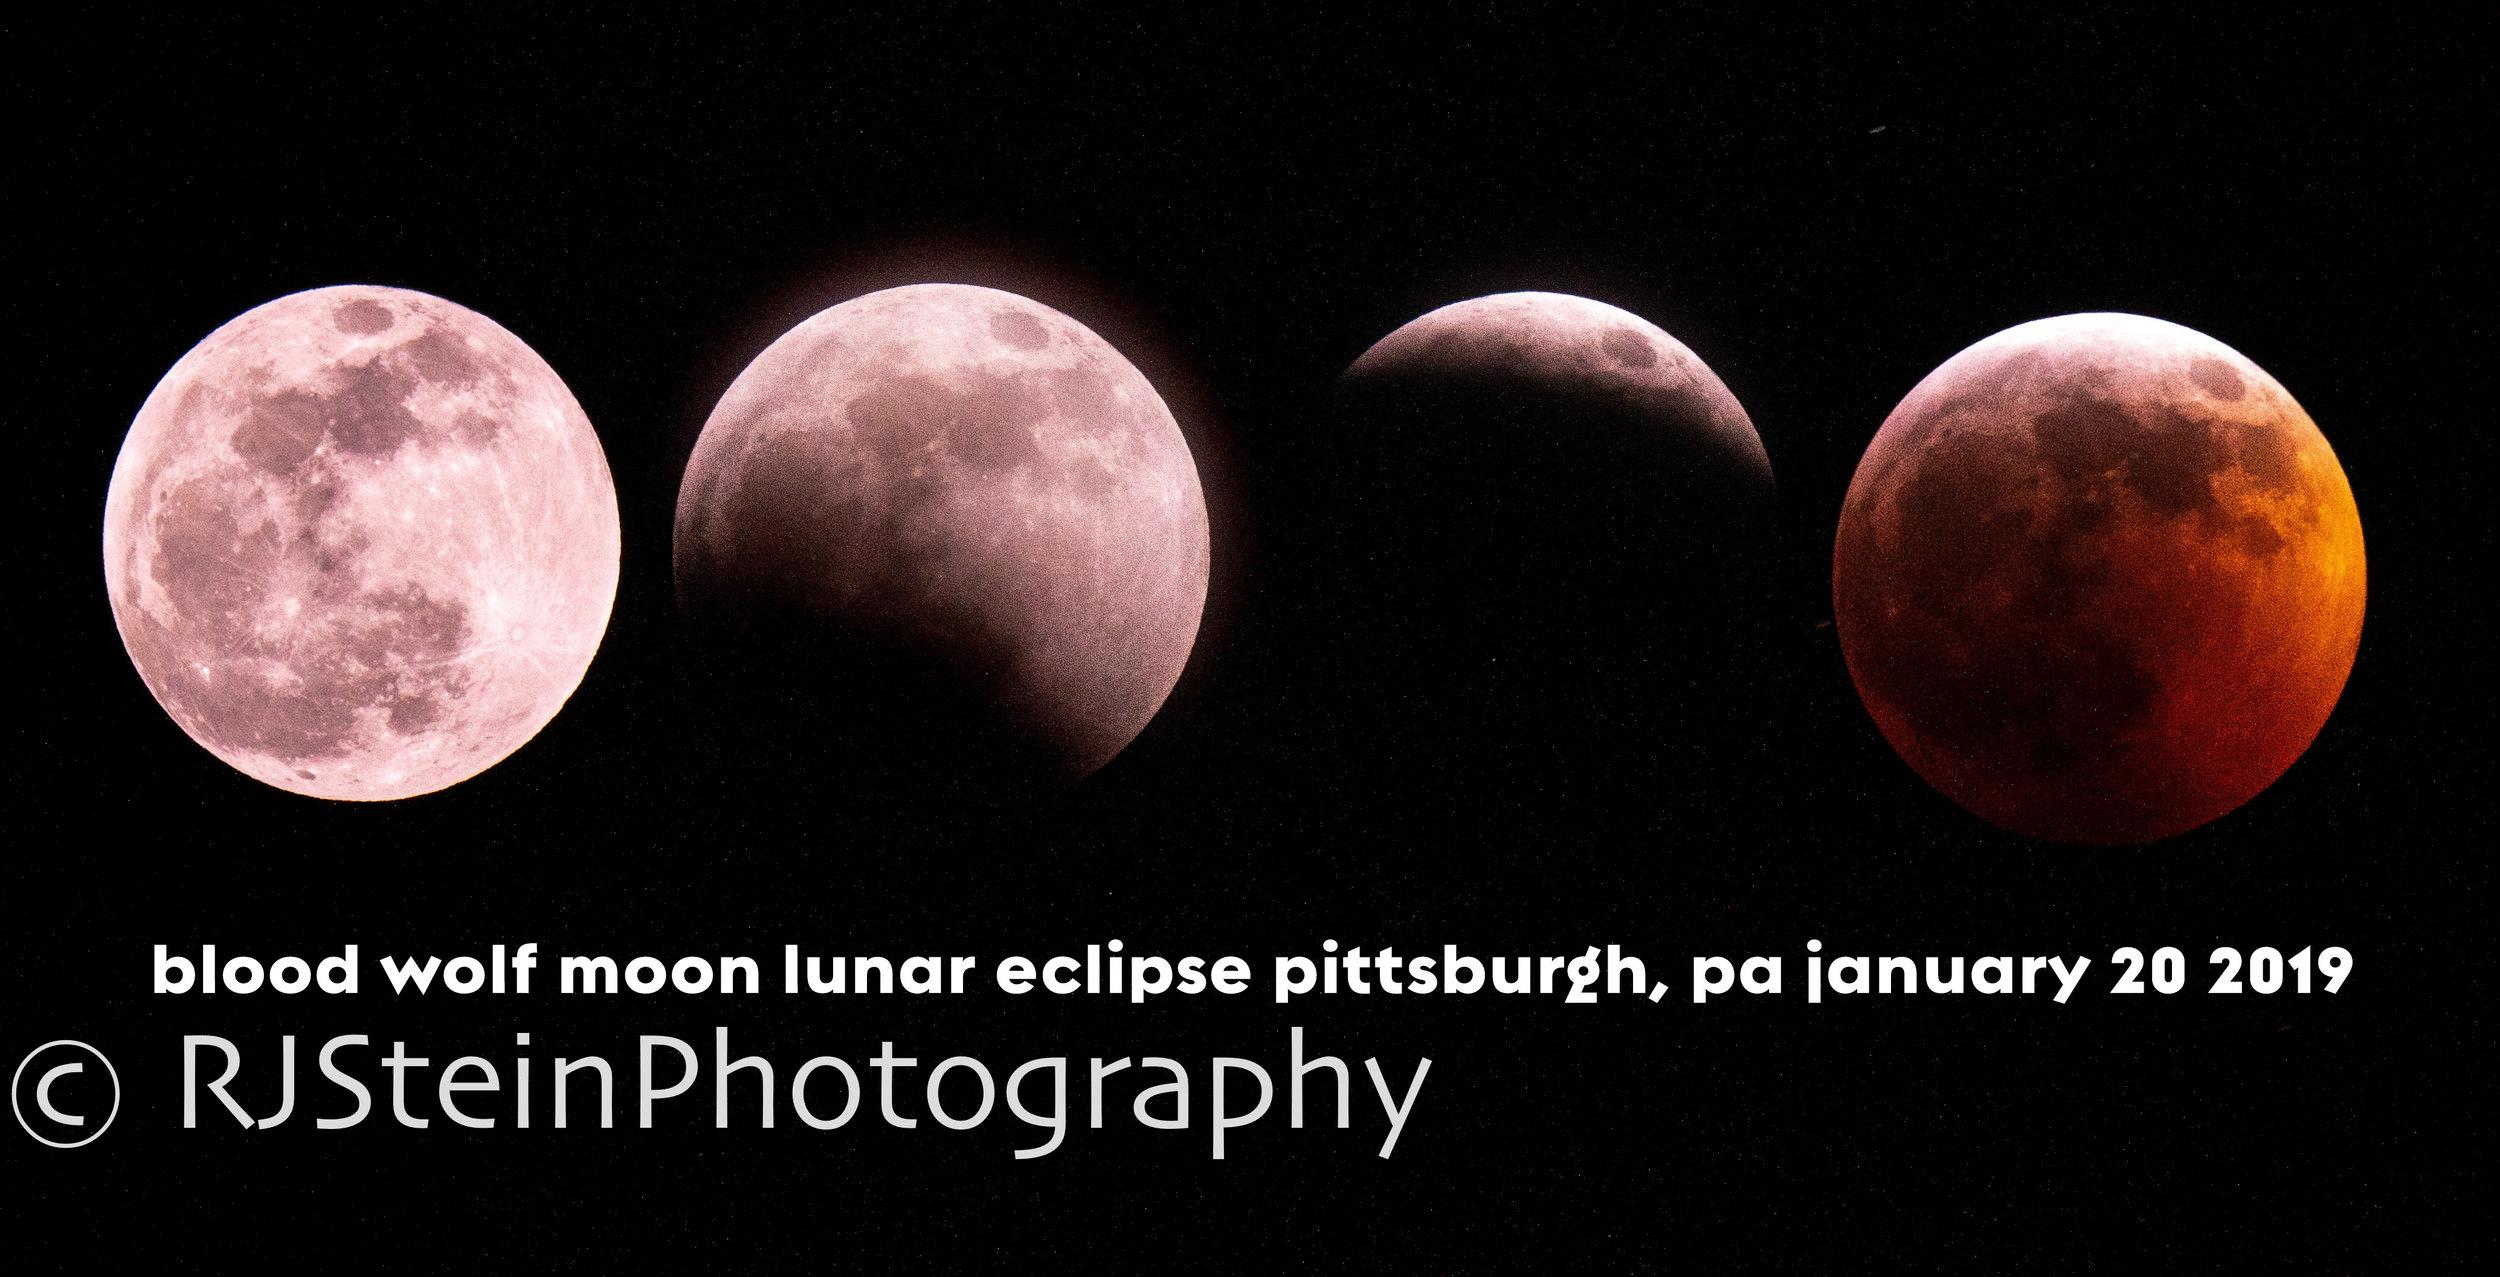 blood wolf moon lunar eclipse pittsburgh, 2019